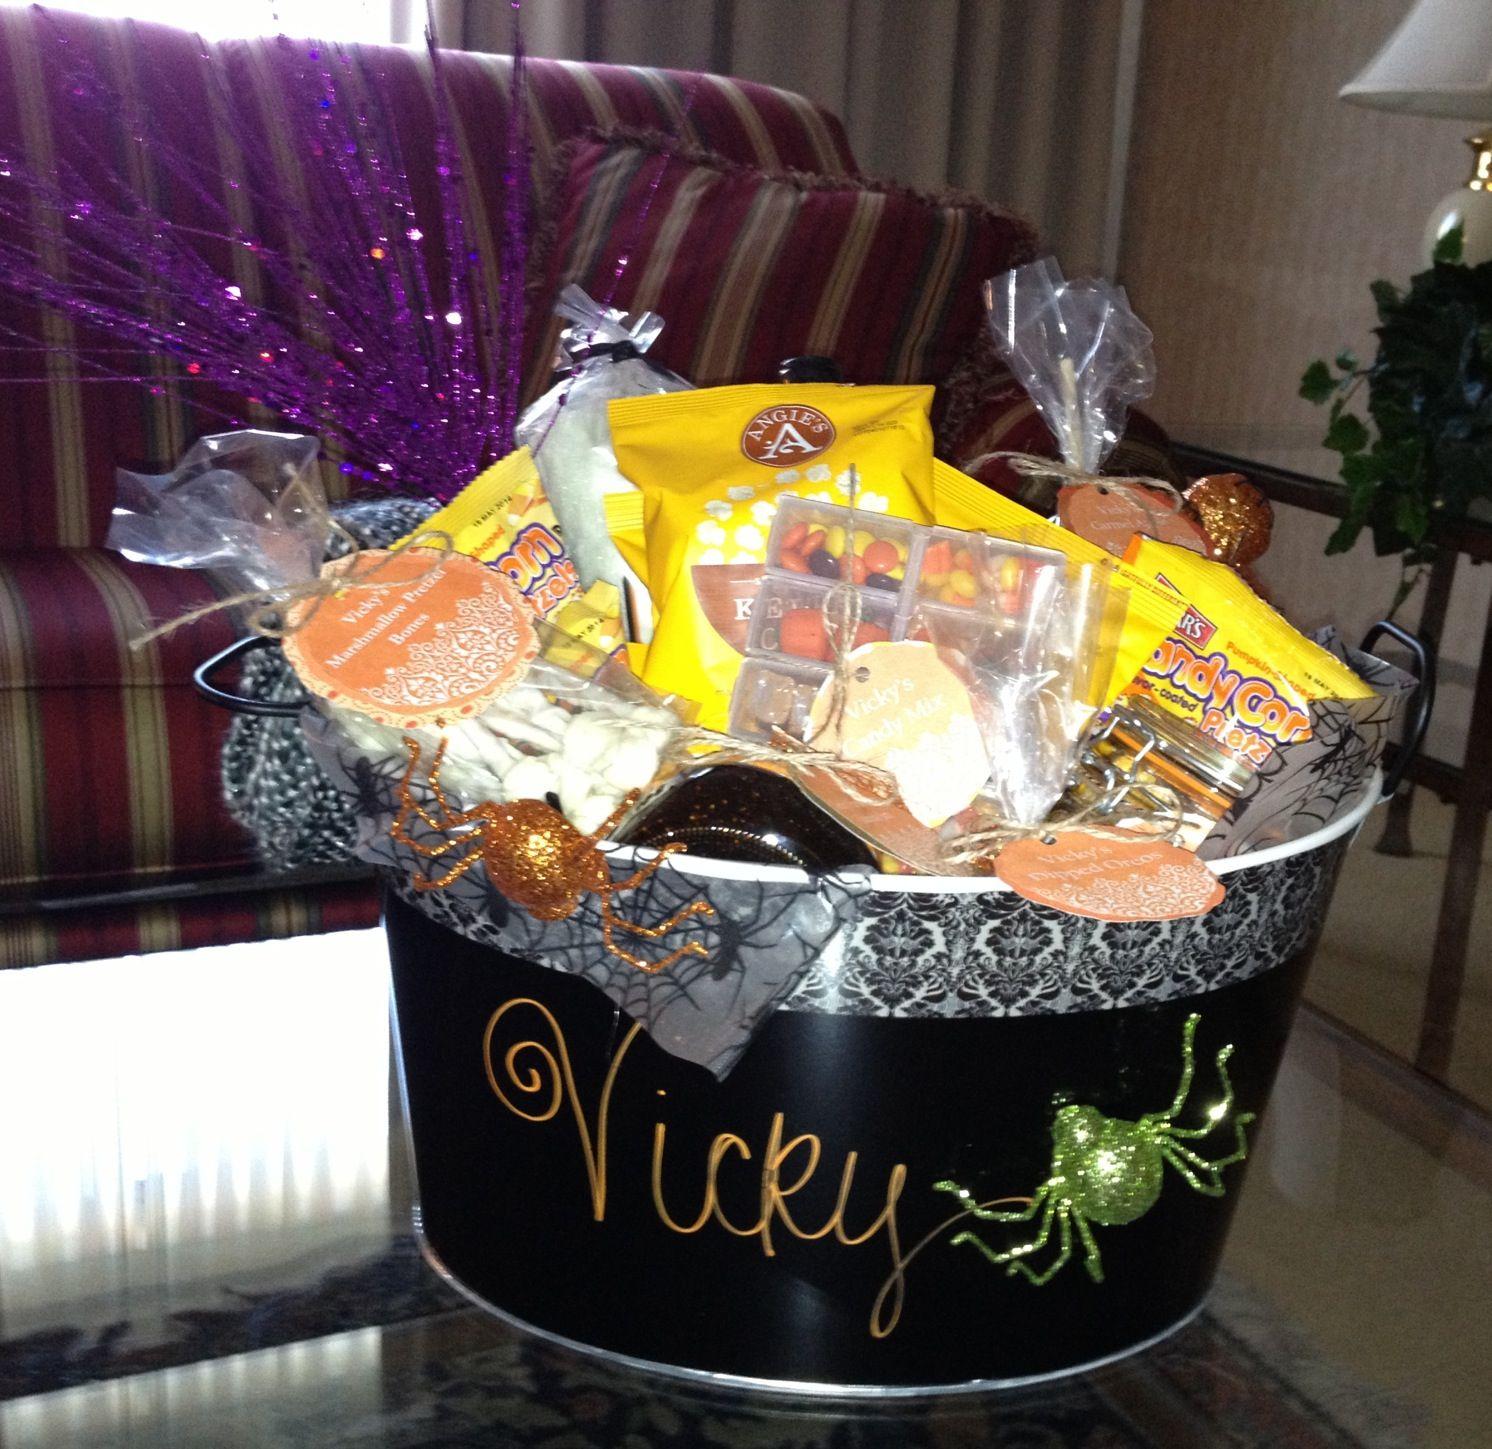 Bridal Shower Gift Basket Climbing On House Halloween: Halloween Gift Basket